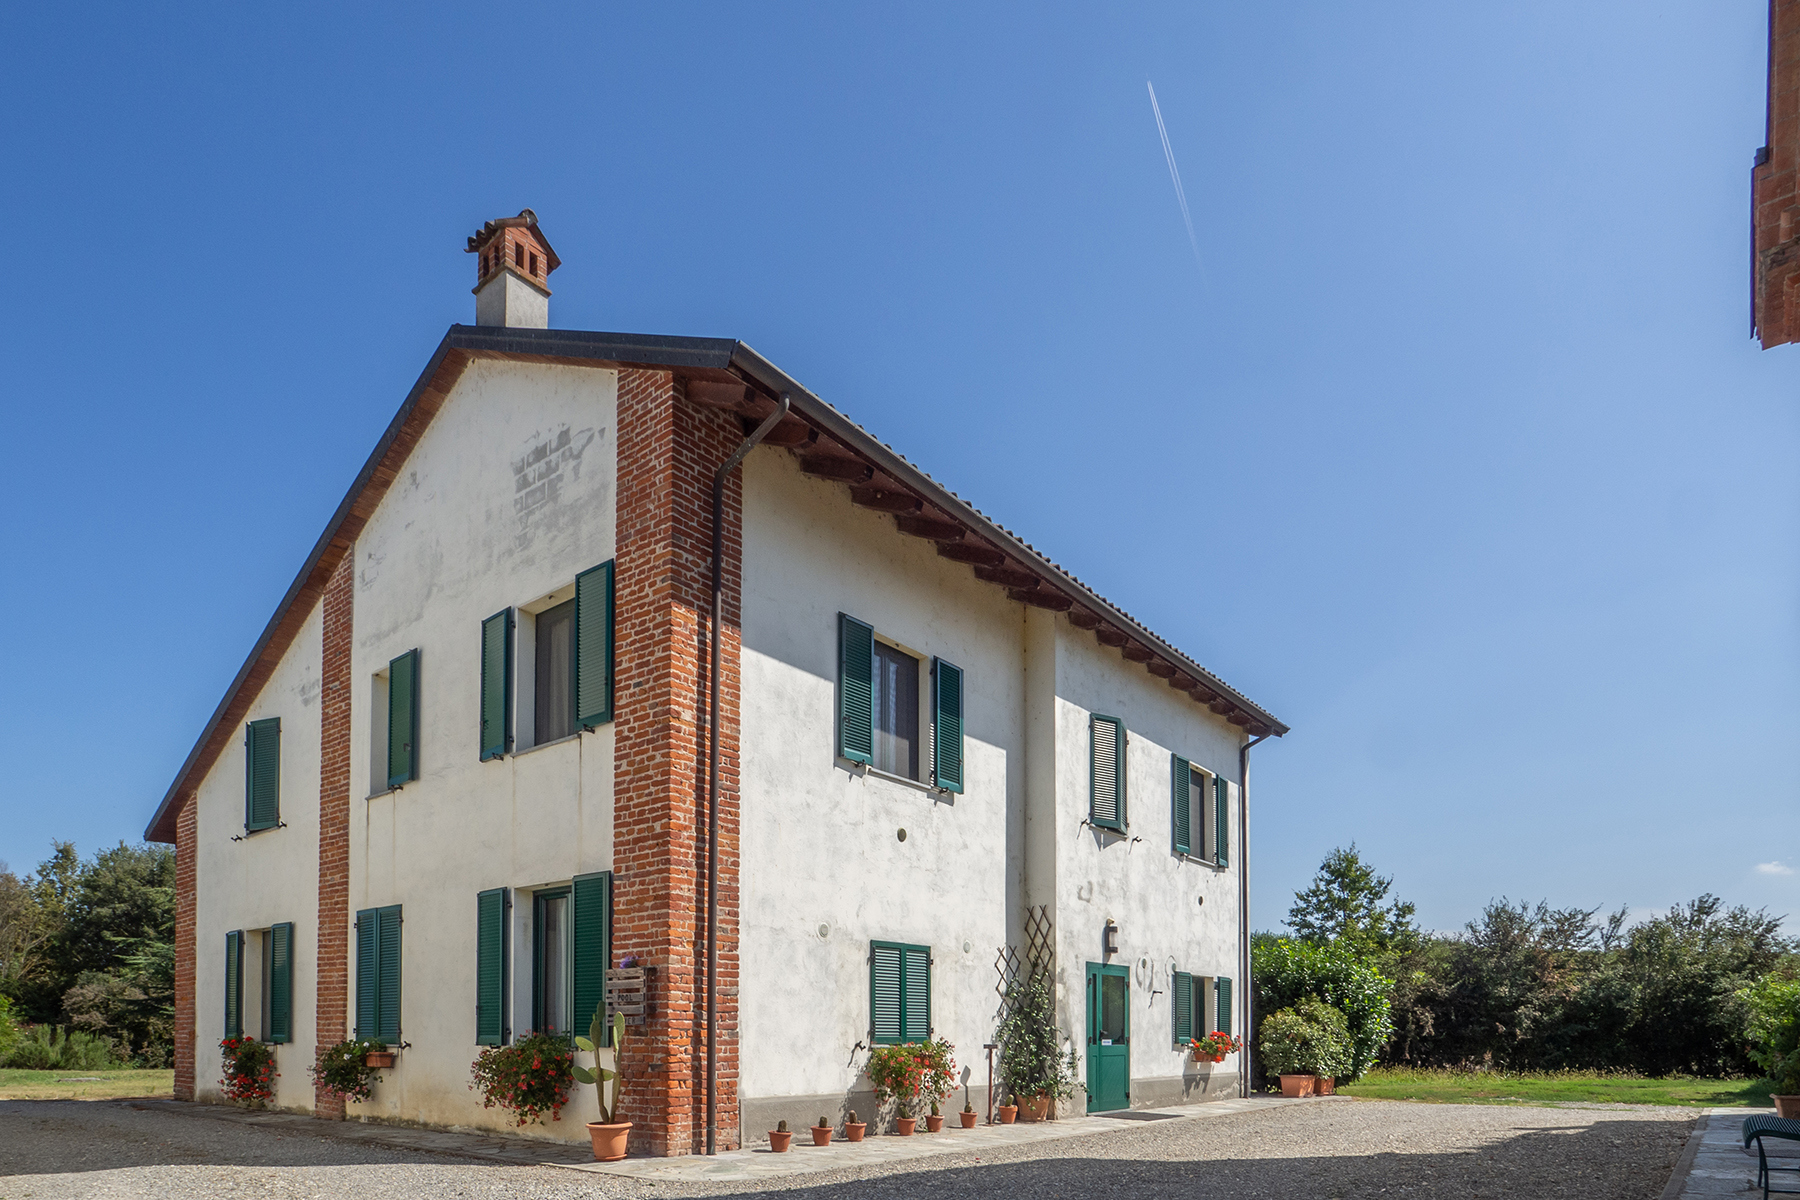 Rustico in Vendita a Valenza: 5 locali, 1800 mq - Foto 25